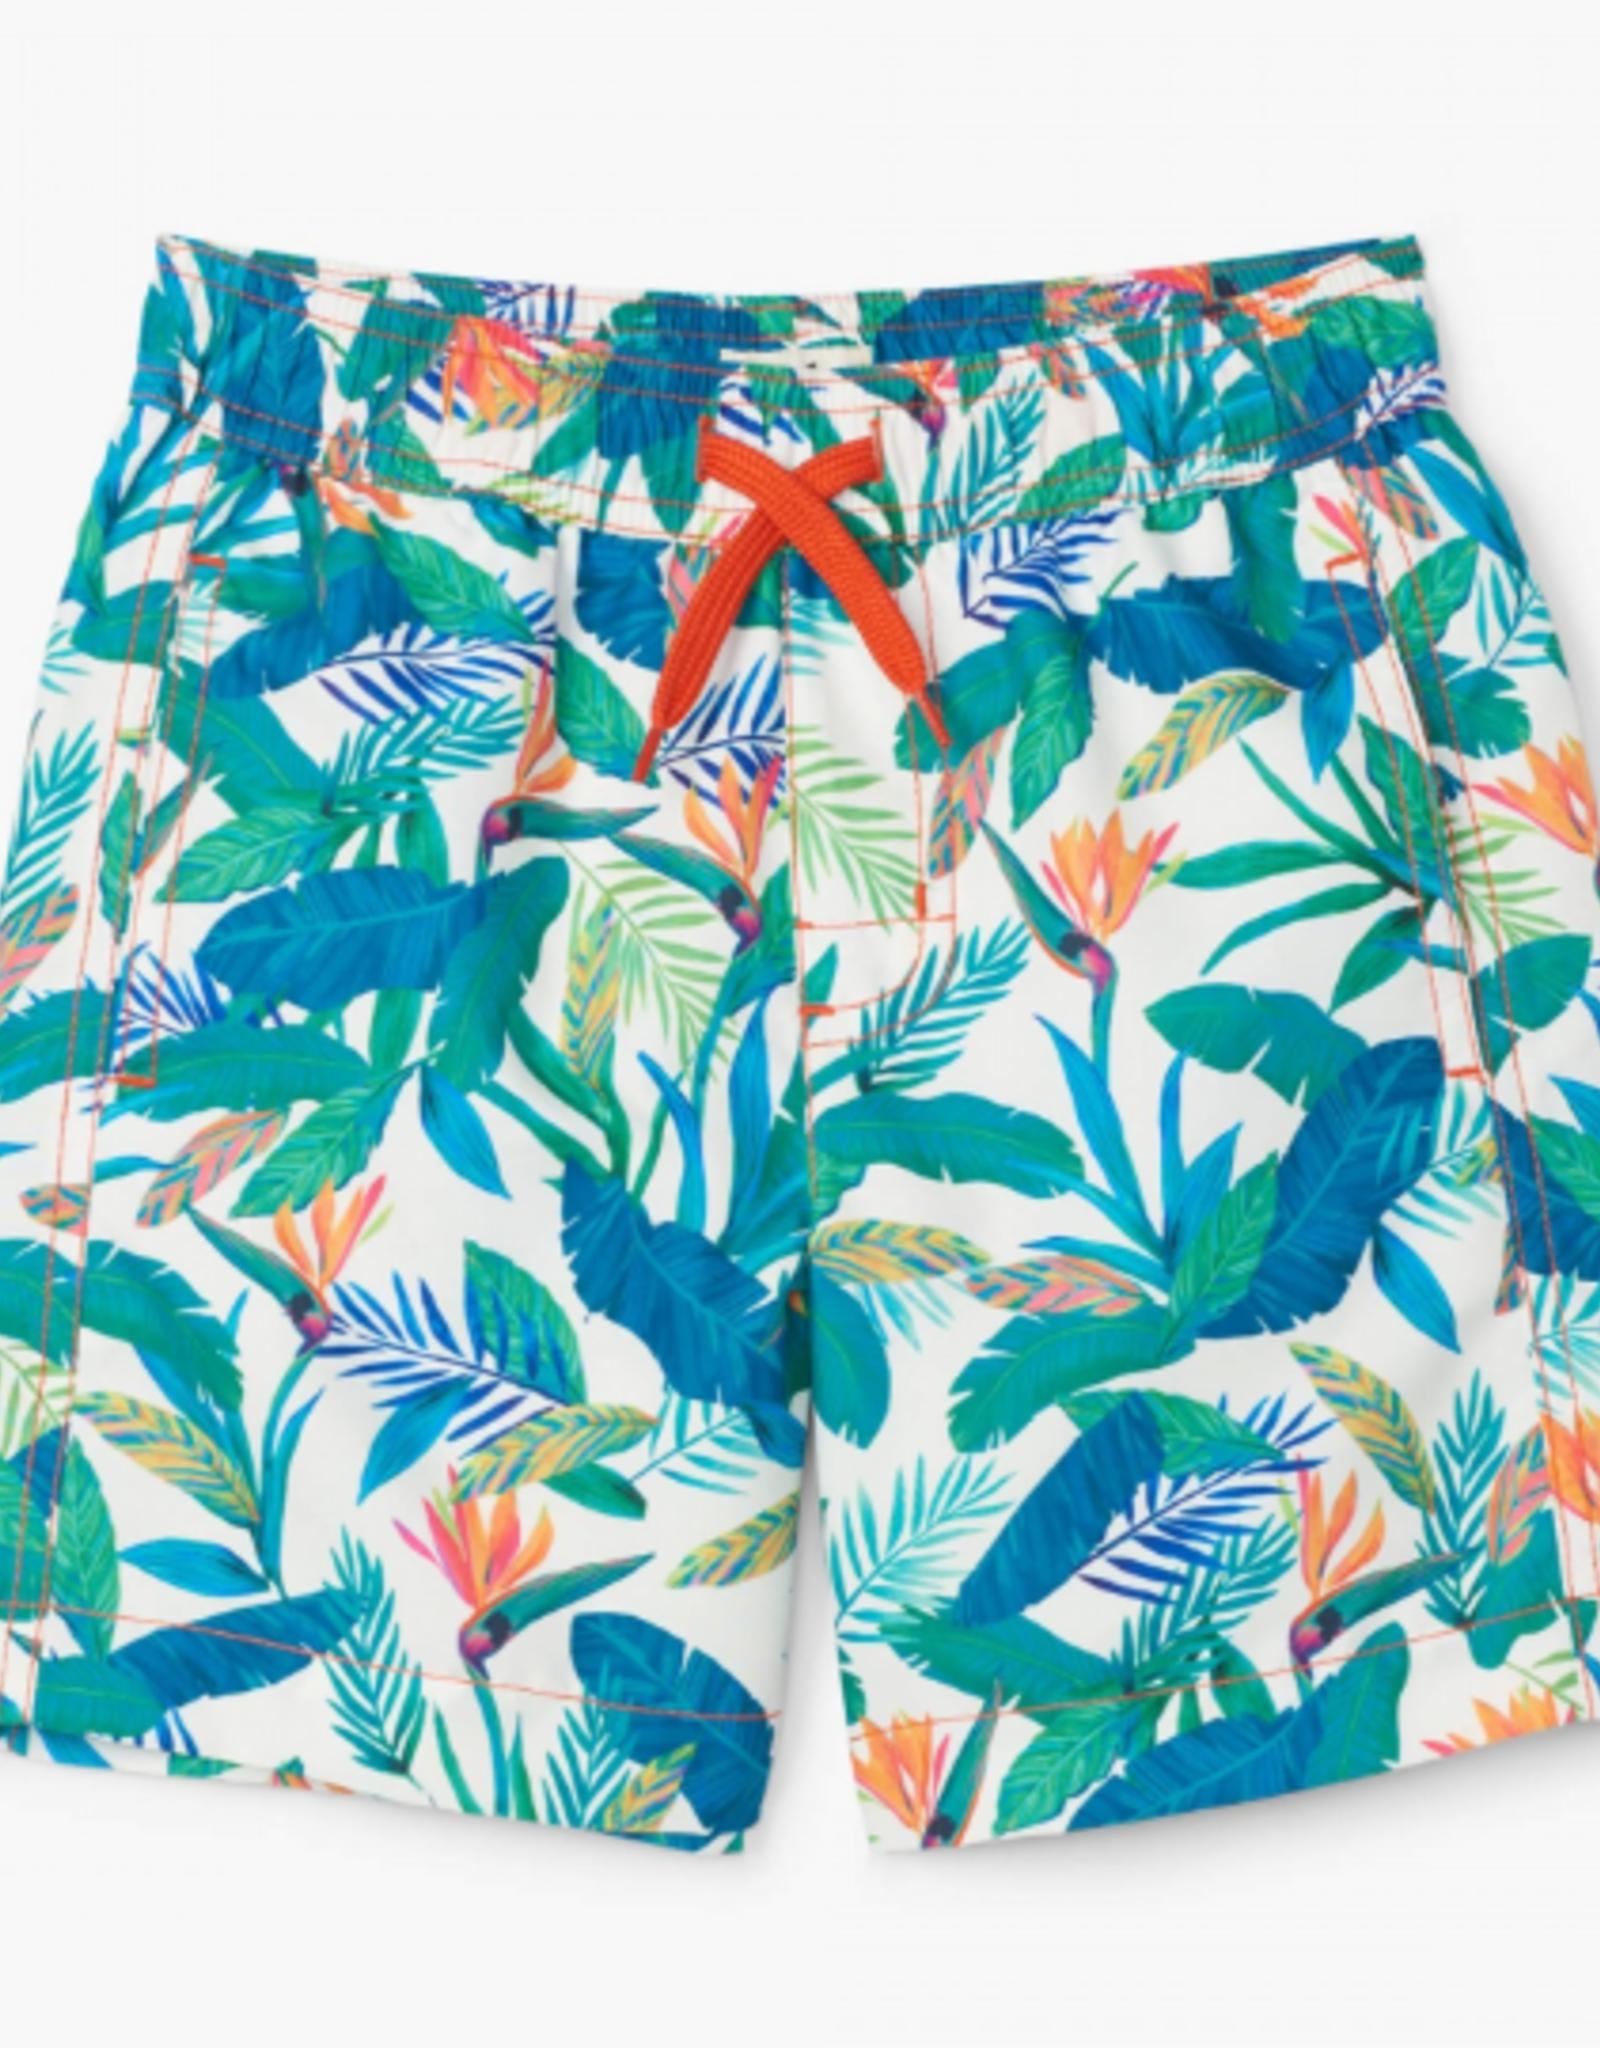 Hatley Tropical Paradise Swim Trunks